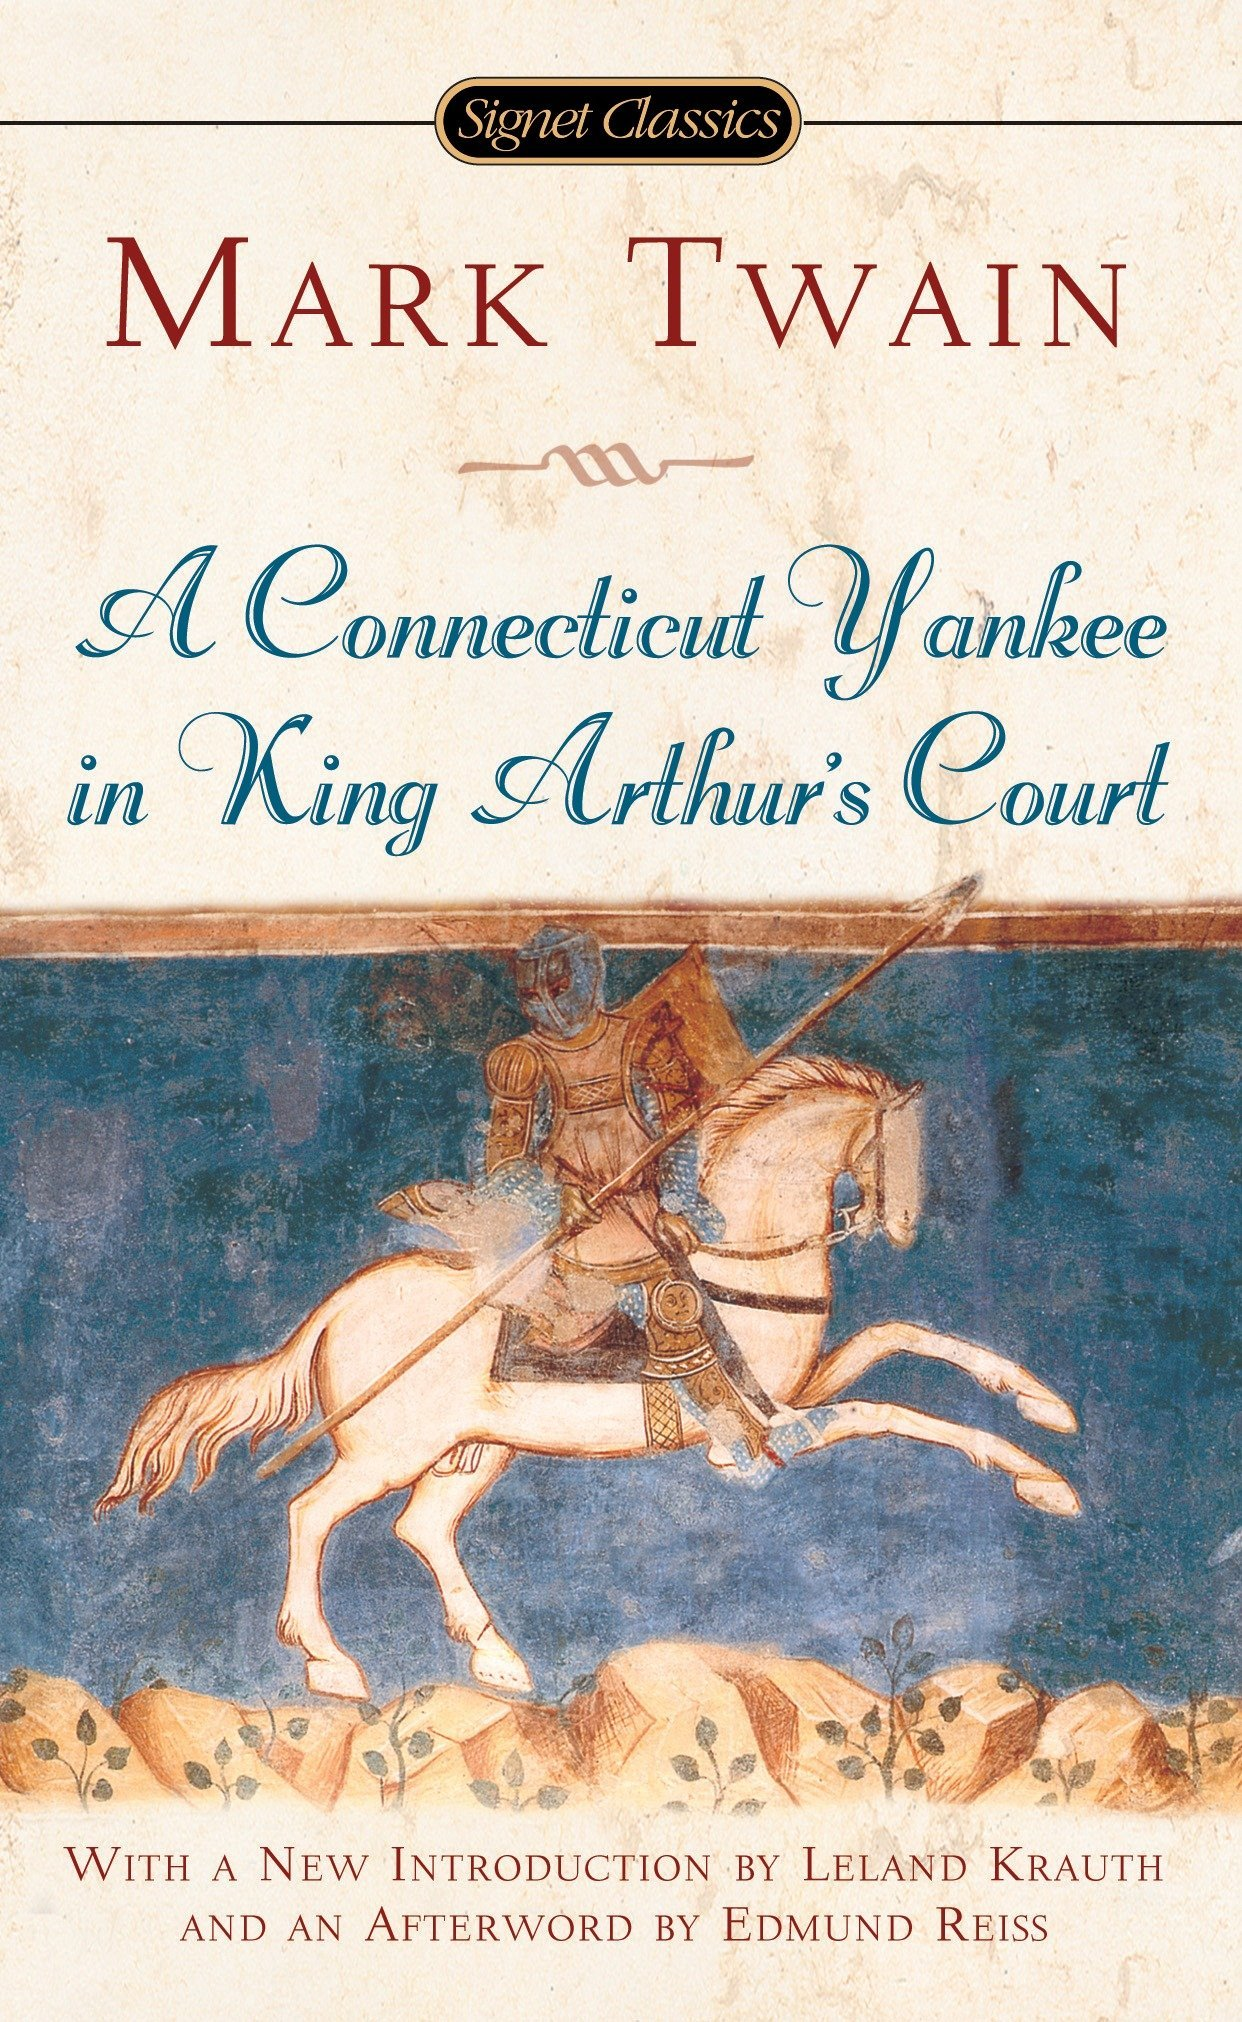 Connecticut Yankee Arthurs Bantam Classics product image